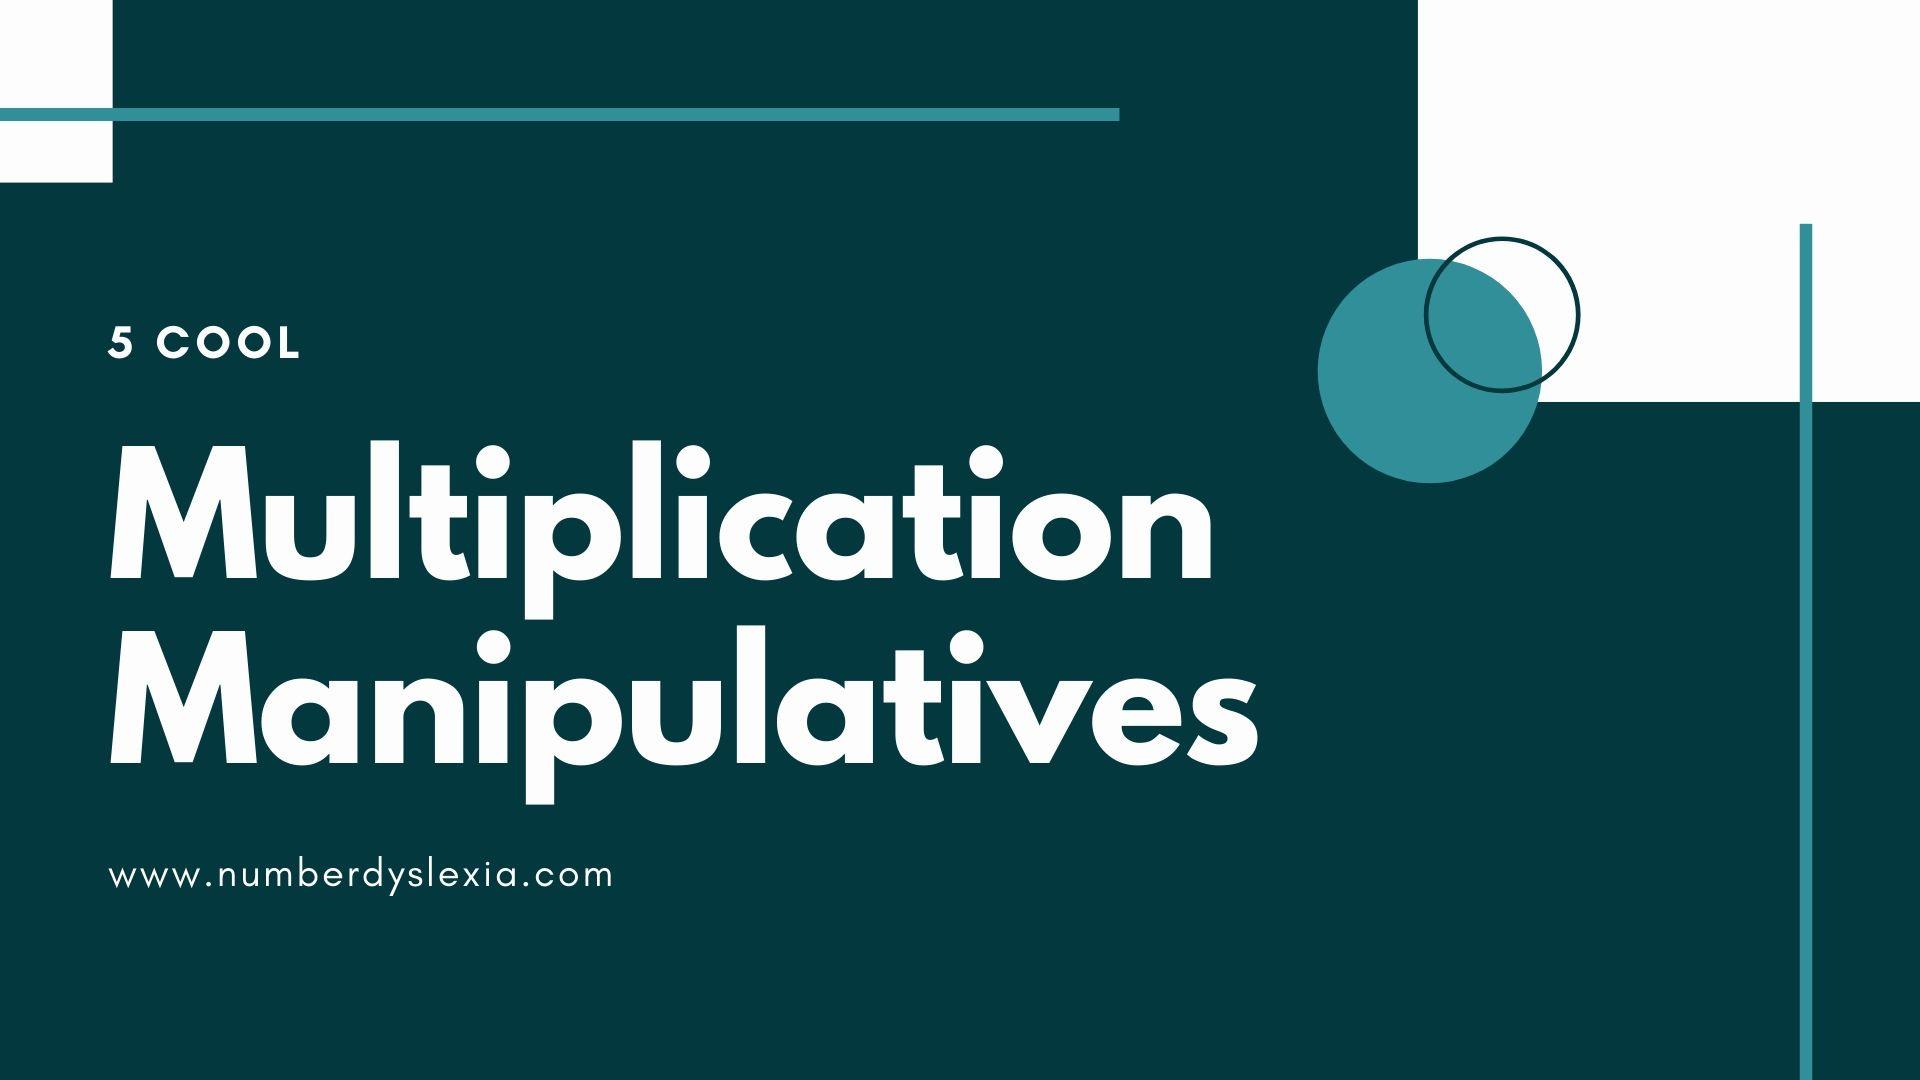 list of 5 cool multiplication manipulatives